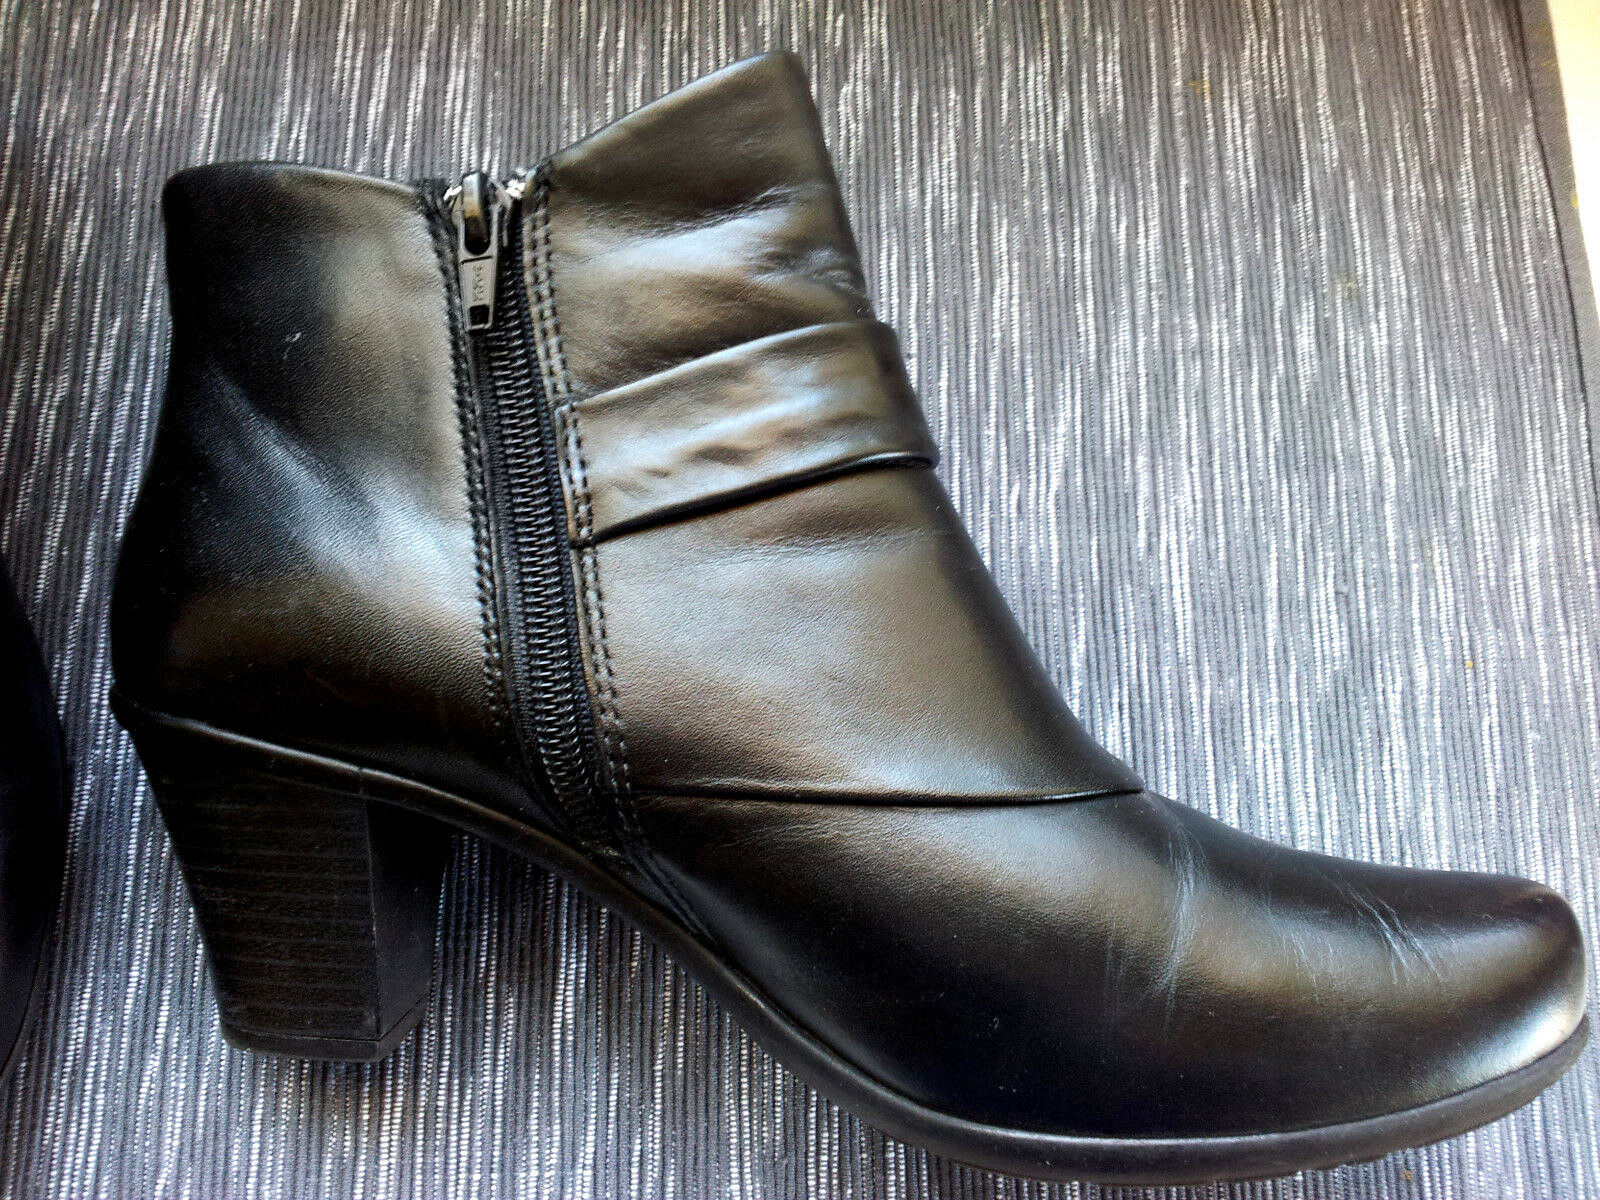 Planet Shoes - Pia Leather Shoes - Size Women Women Women Aus 8 dc2b6b